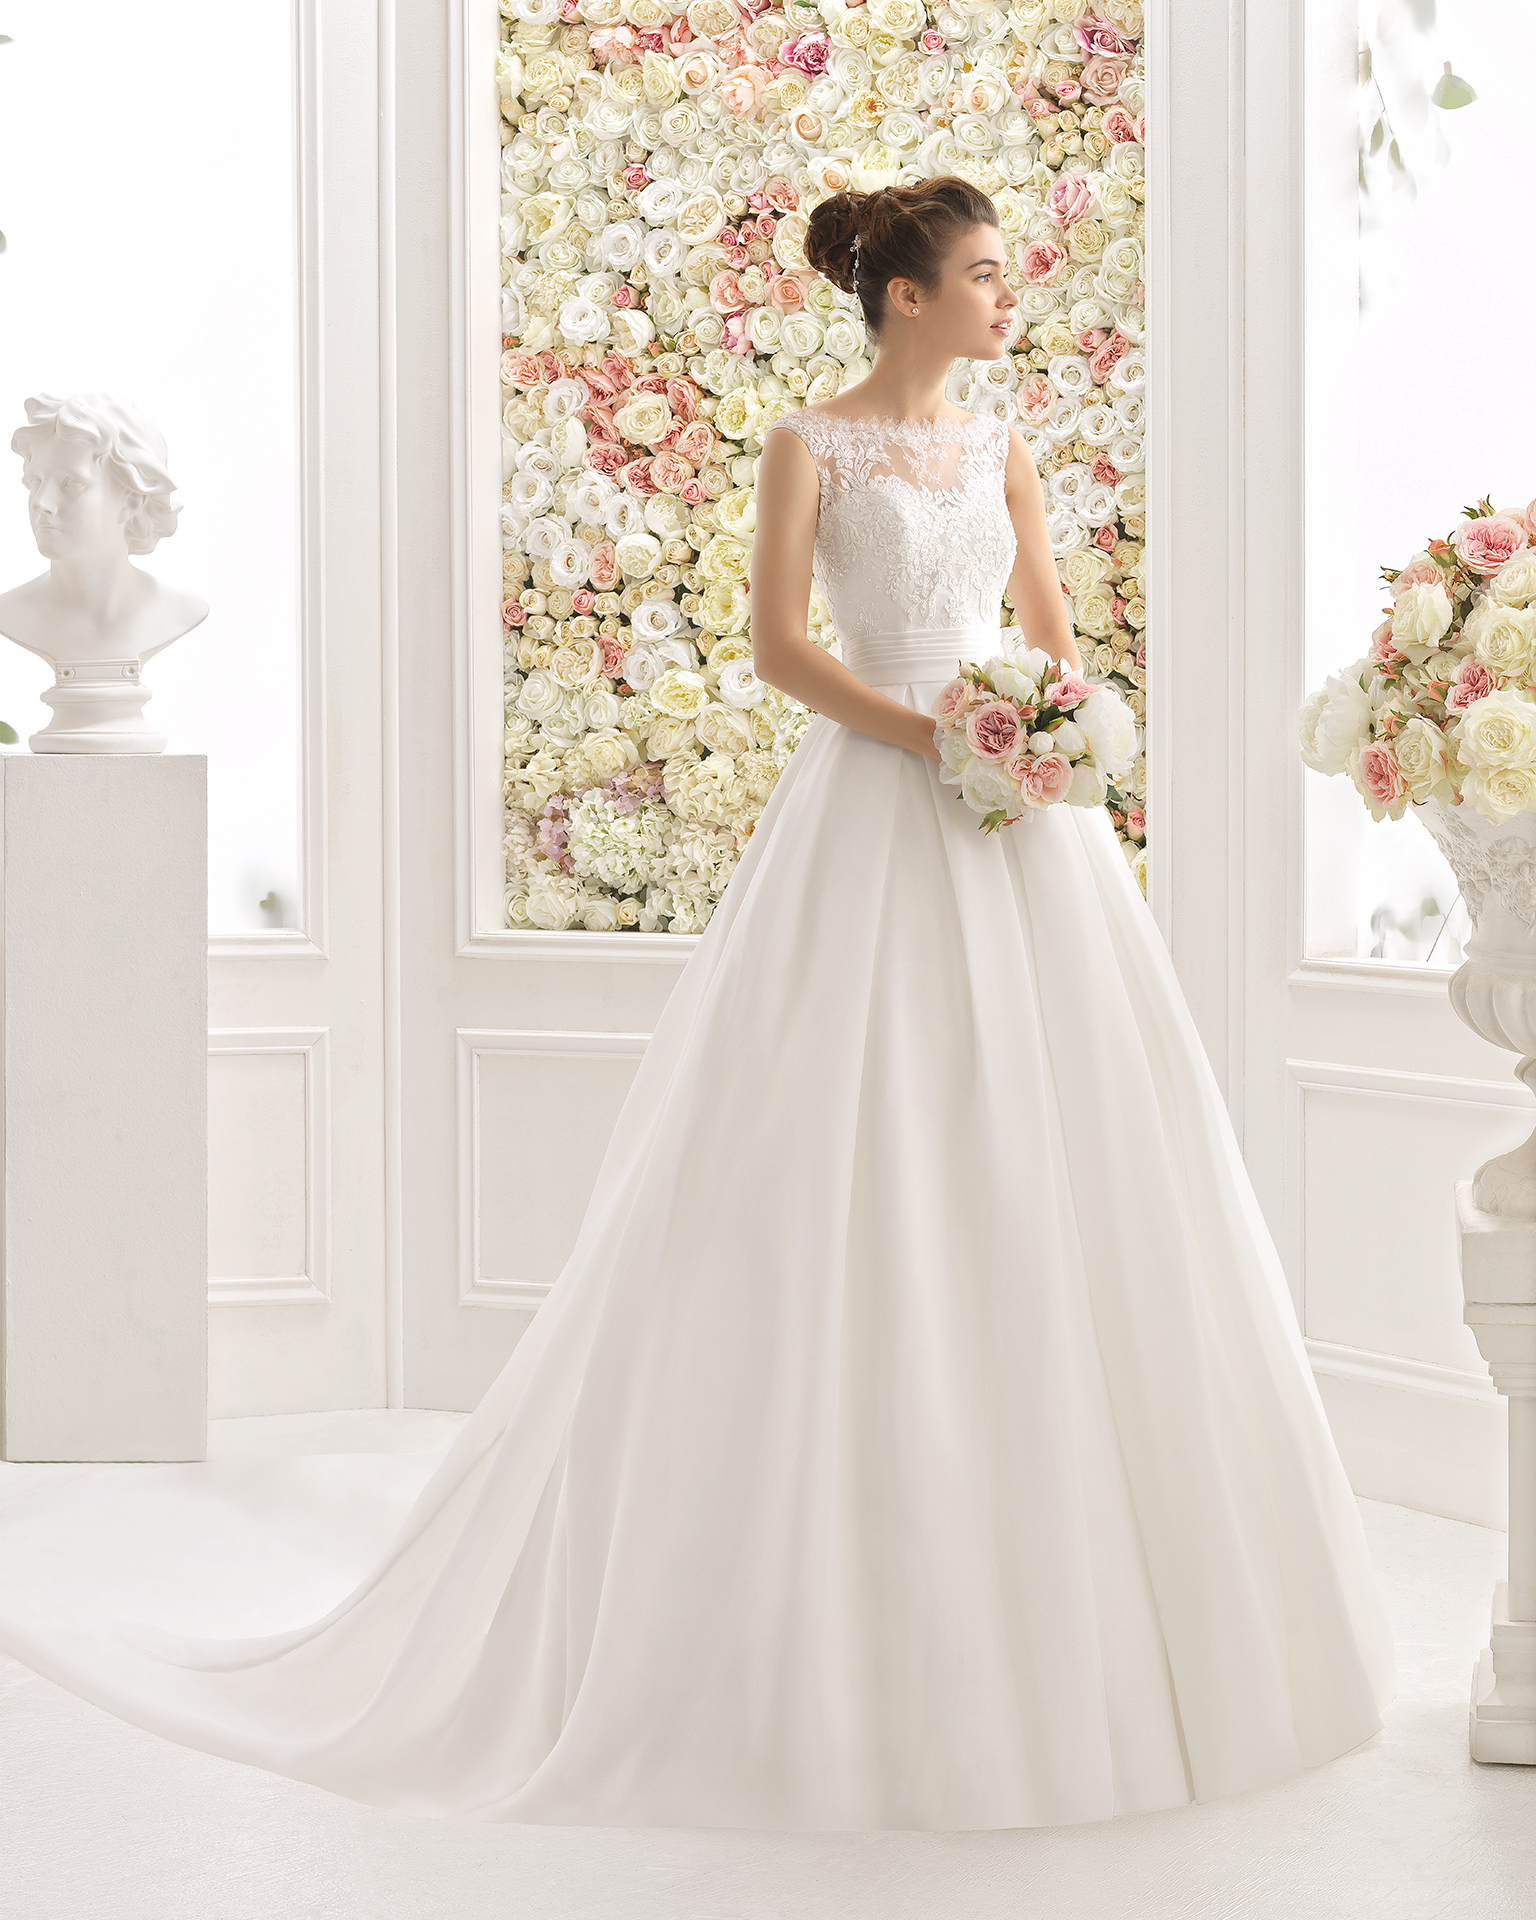 CELEBRE新娘婚纱 - Aire Barcelona 2017